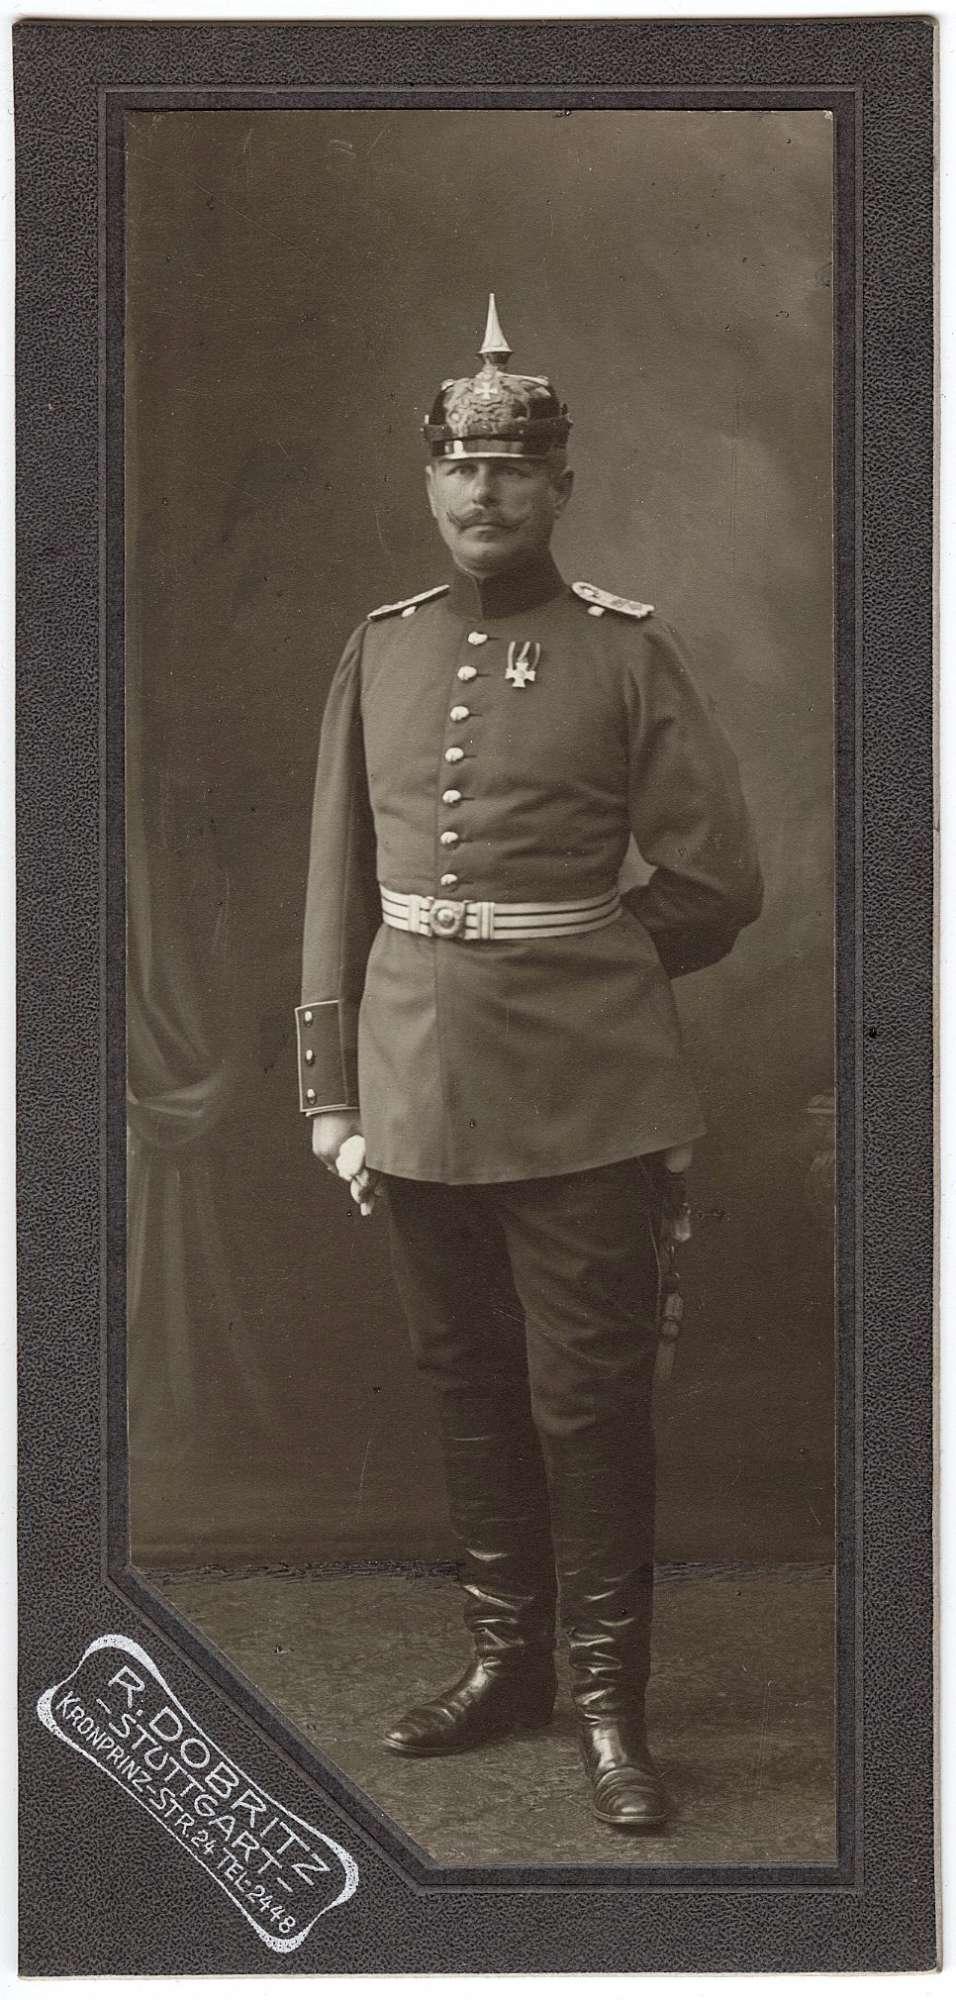 Heckel, Emil, Bild 1